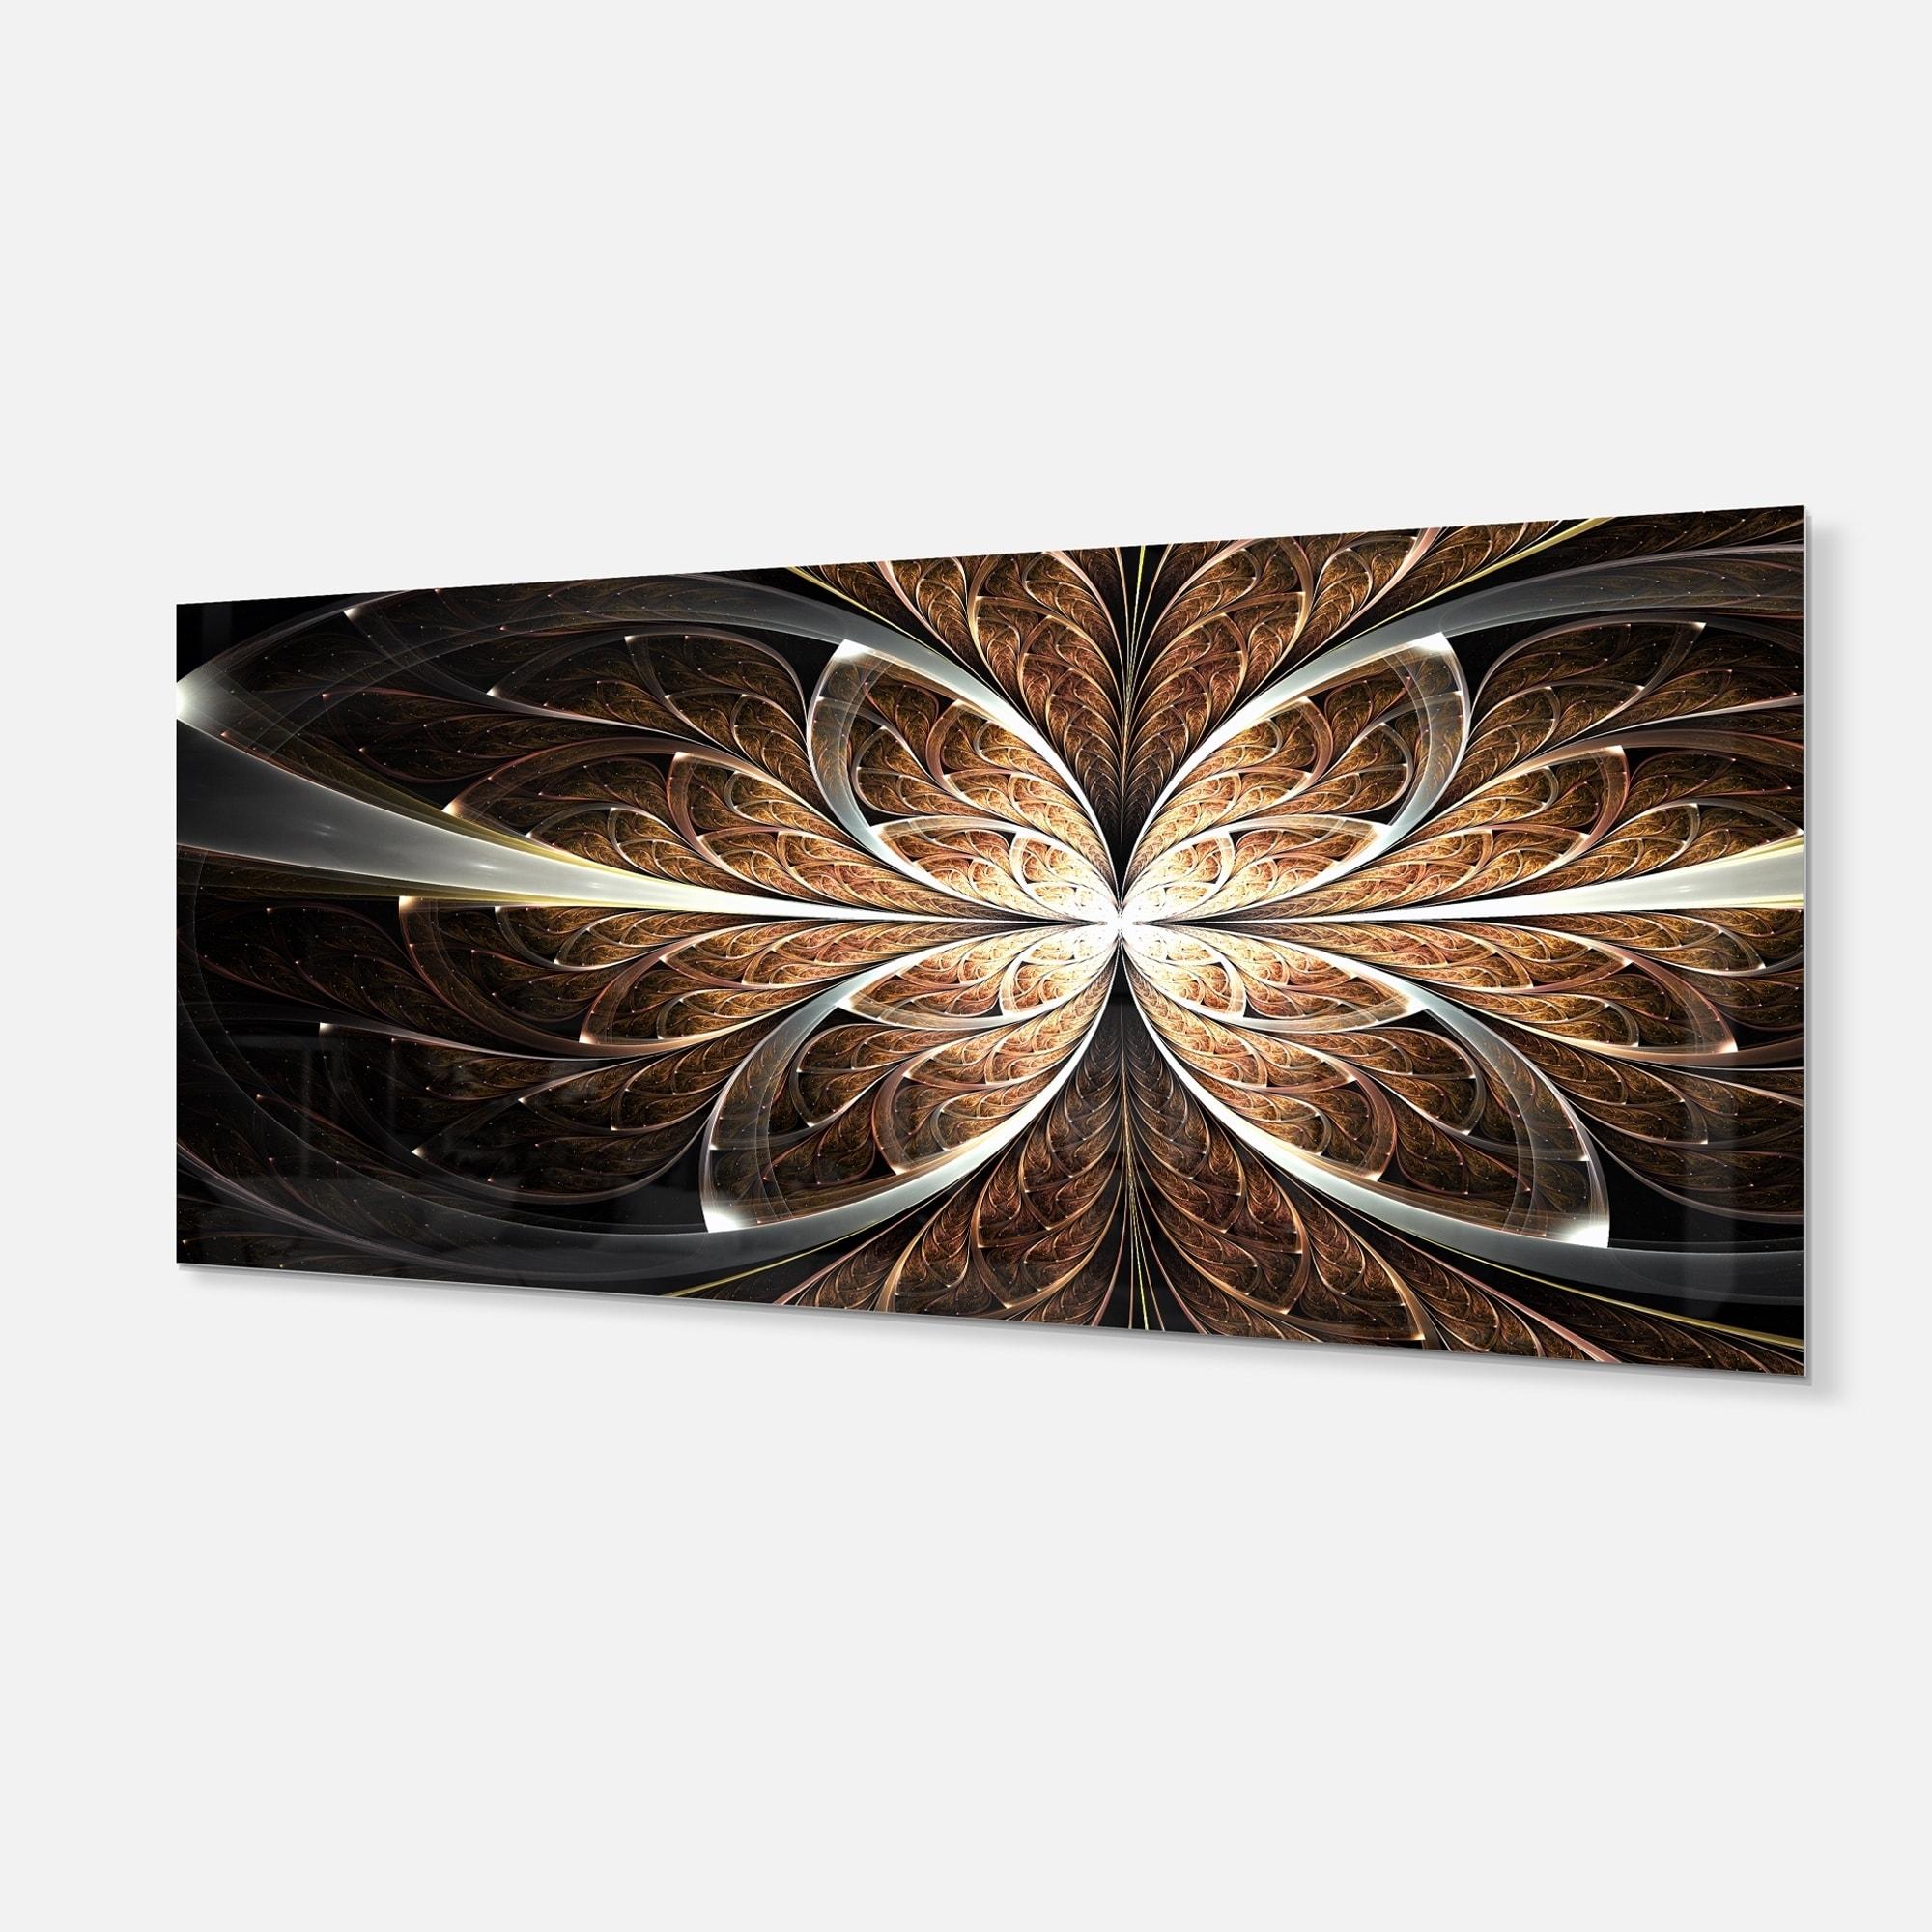 Fractal Flower Brown Black Digital Art Large Floral Glossy Metal Wall Art Overstock 12778494